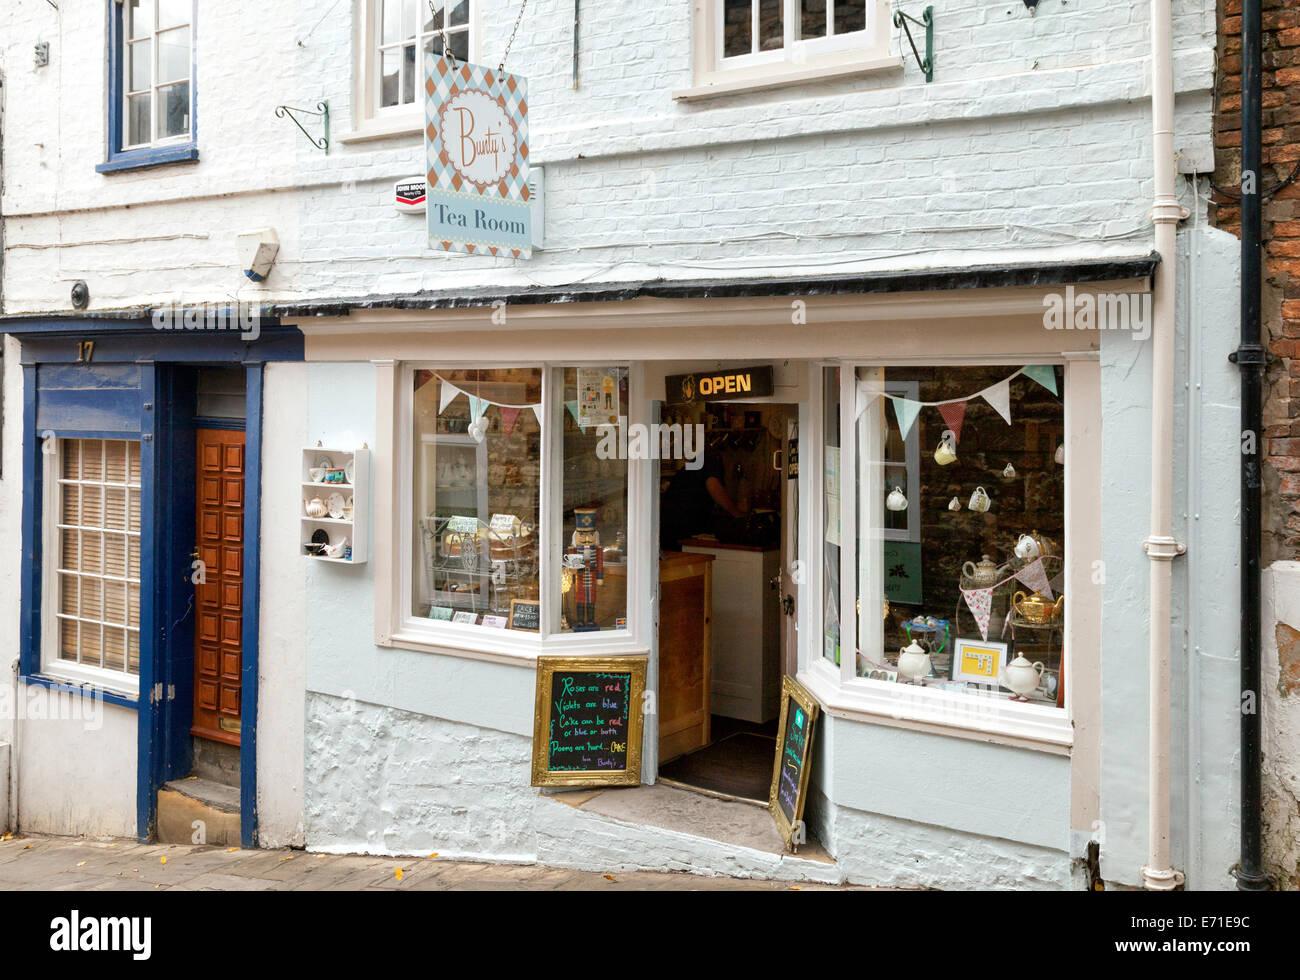 Buntys Tea Room, Steep Hill, Lincoln Lincolnshire UK - Stock Image